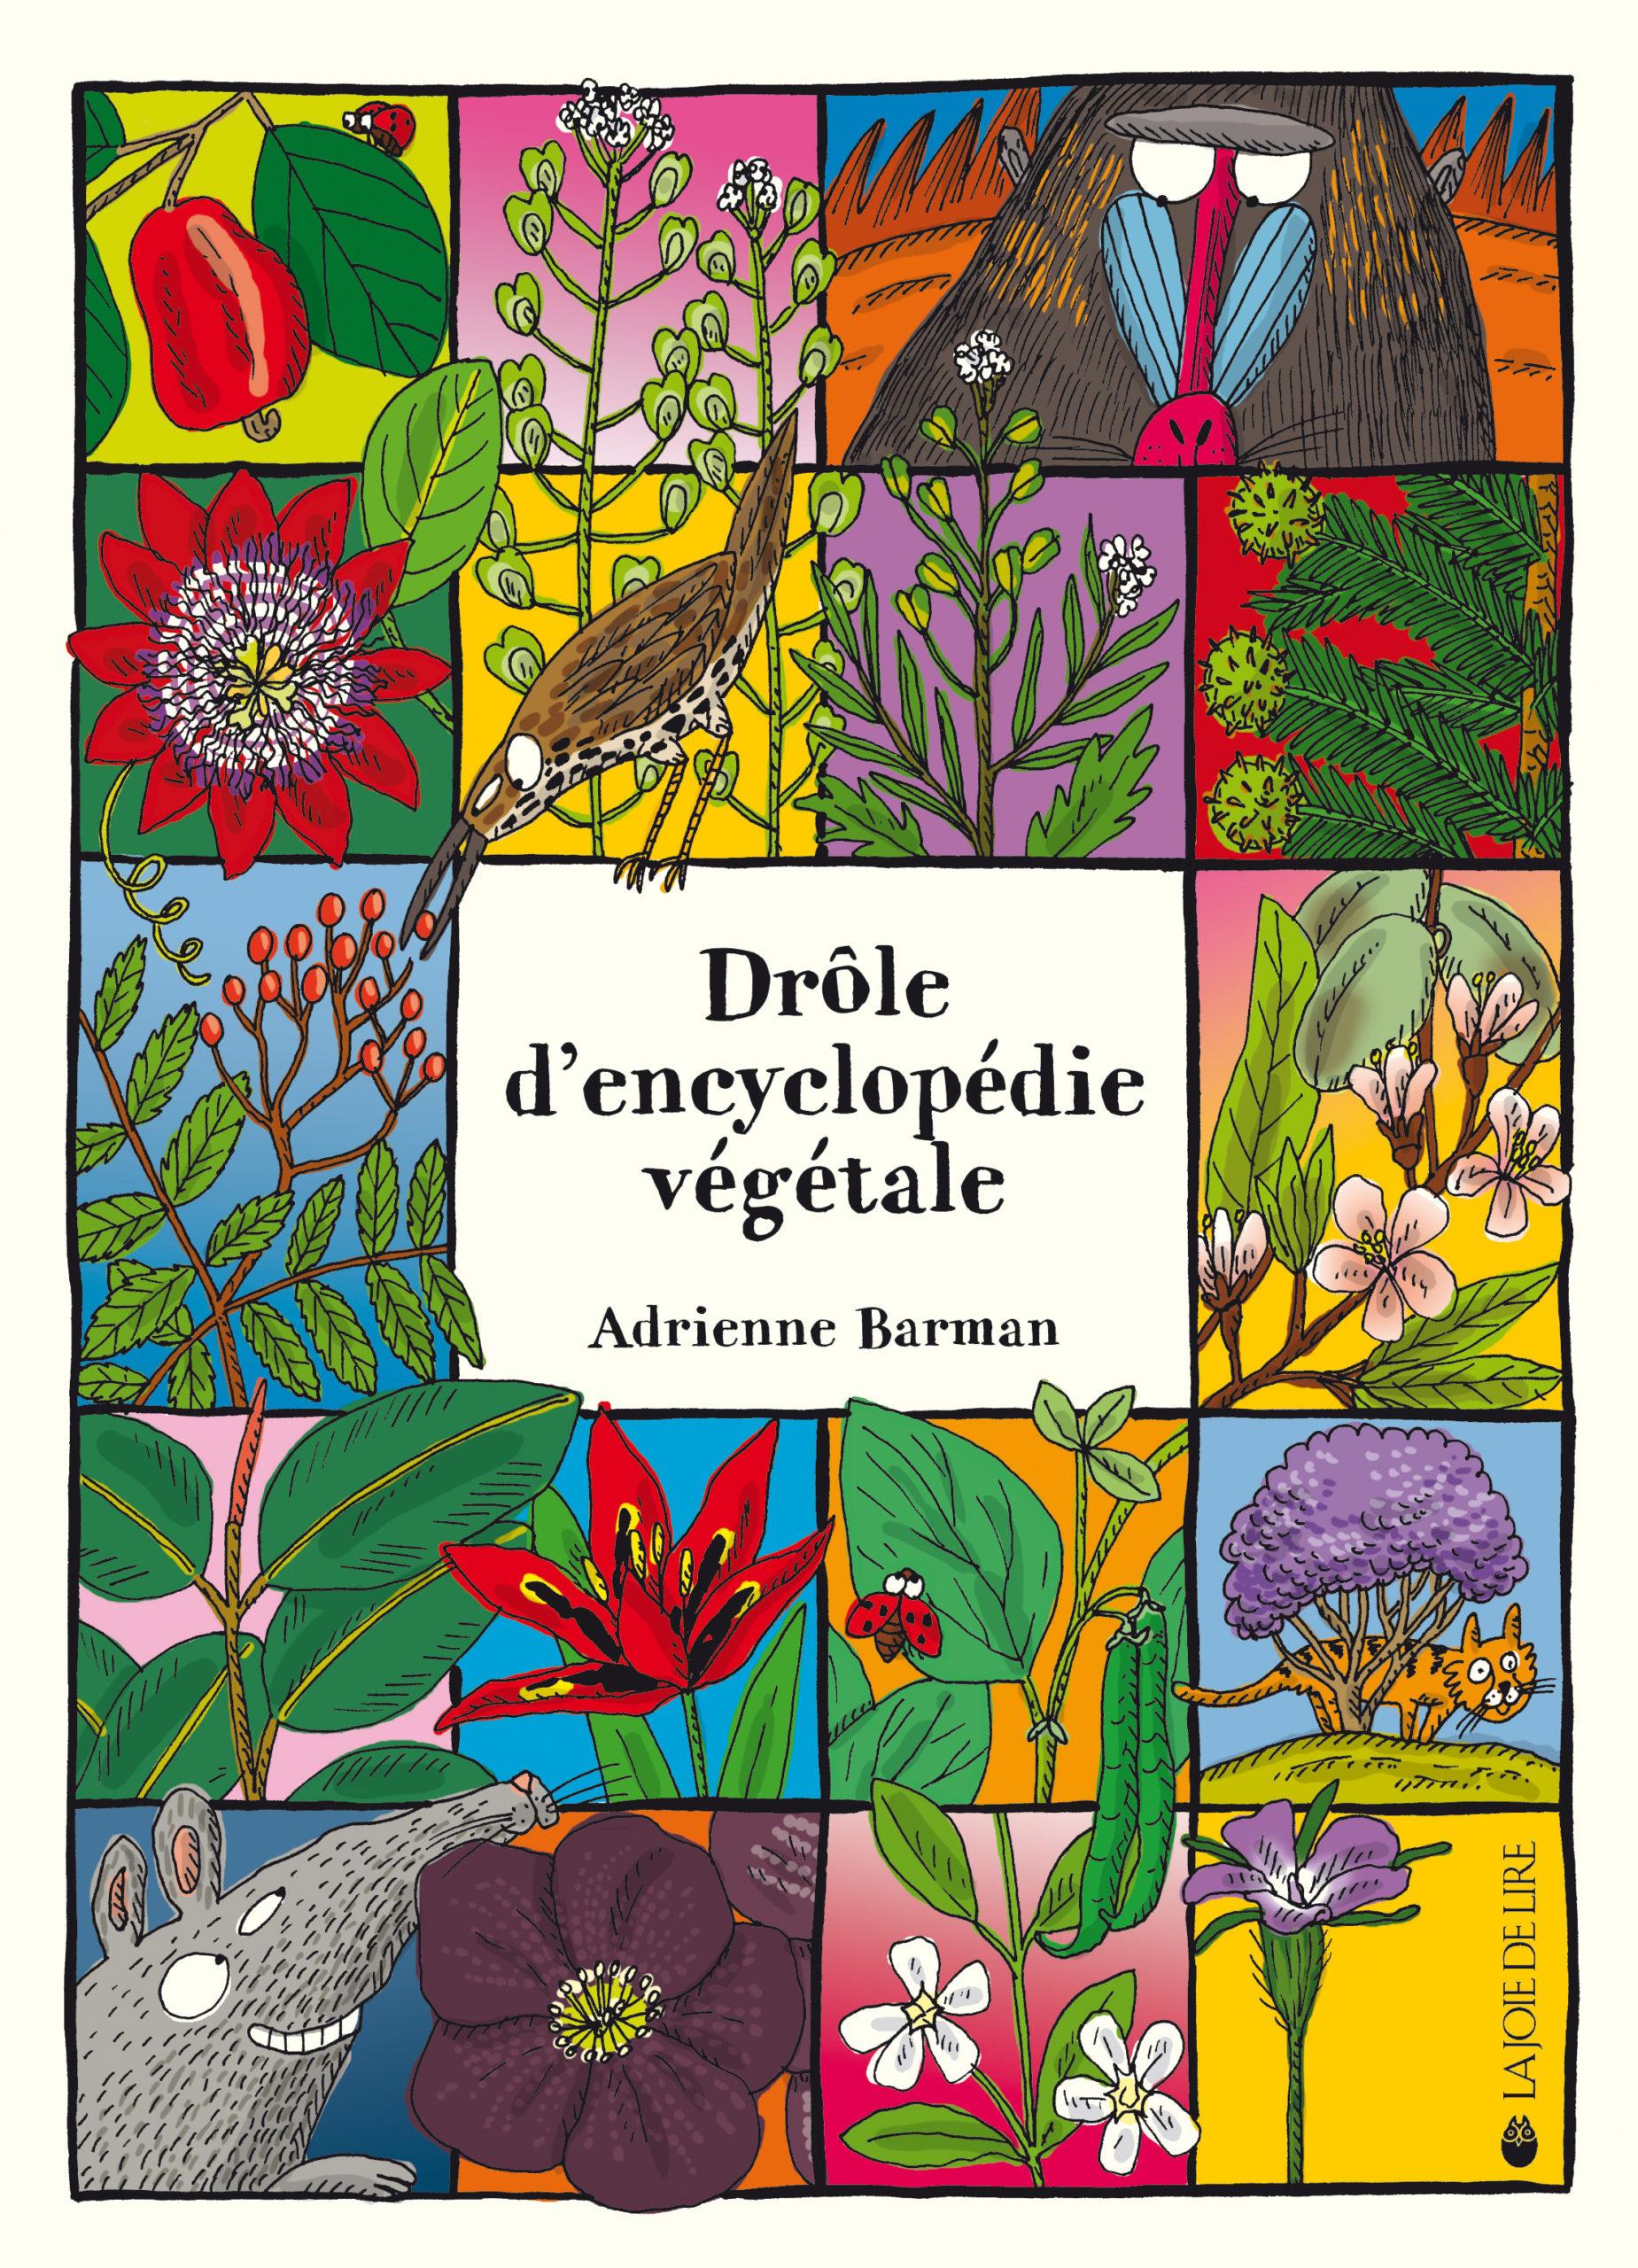 Drole D Encyclopedie Vegetale La Joie De Lire